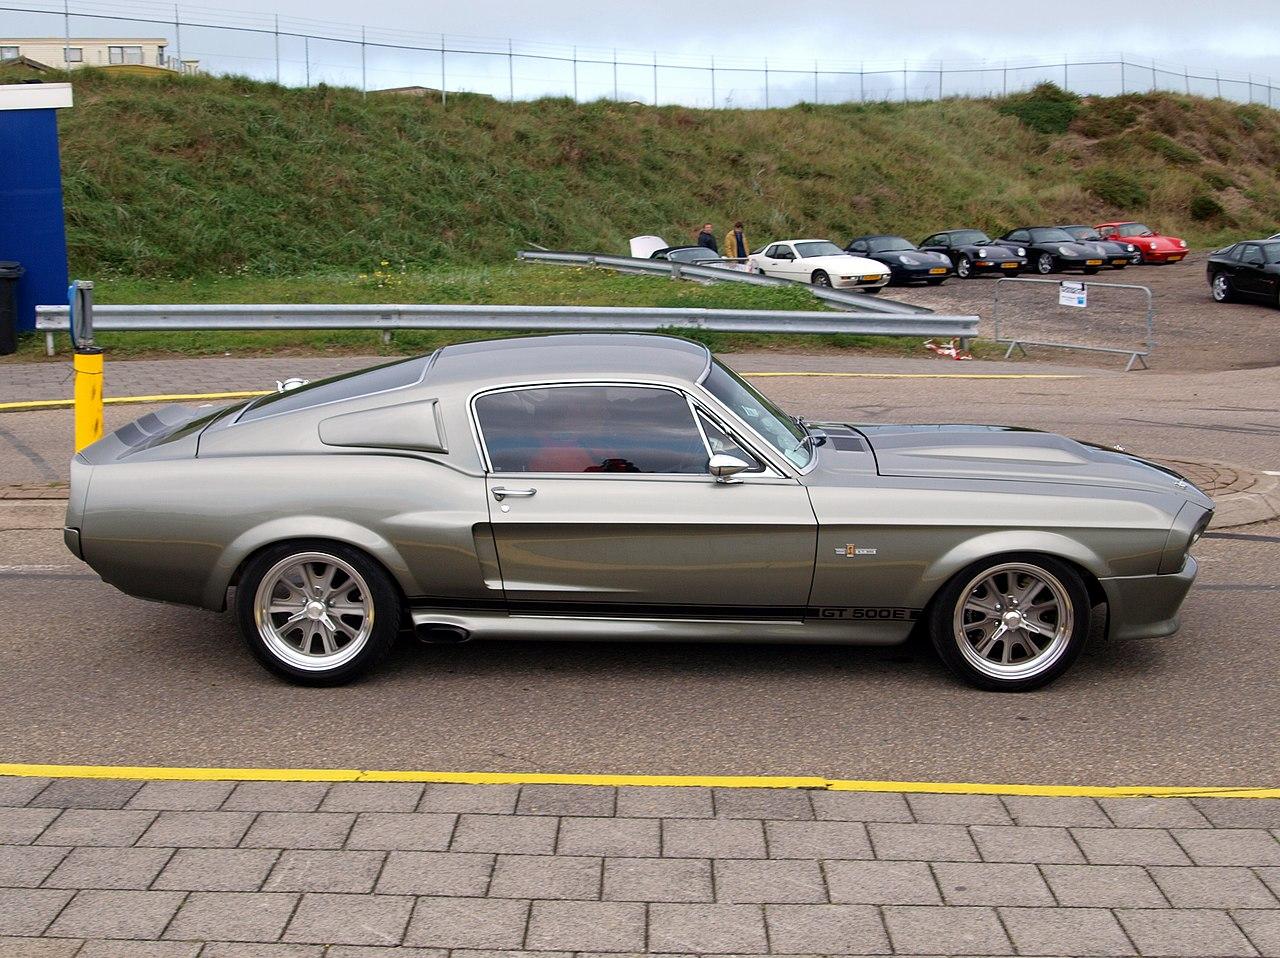 Mustang Gt 500 >> File:Nationale oldtimerdag Zandvoort 2010, 1967 FORD MUSTANG GT 500E, AM-86-78 pic5.JPG ...